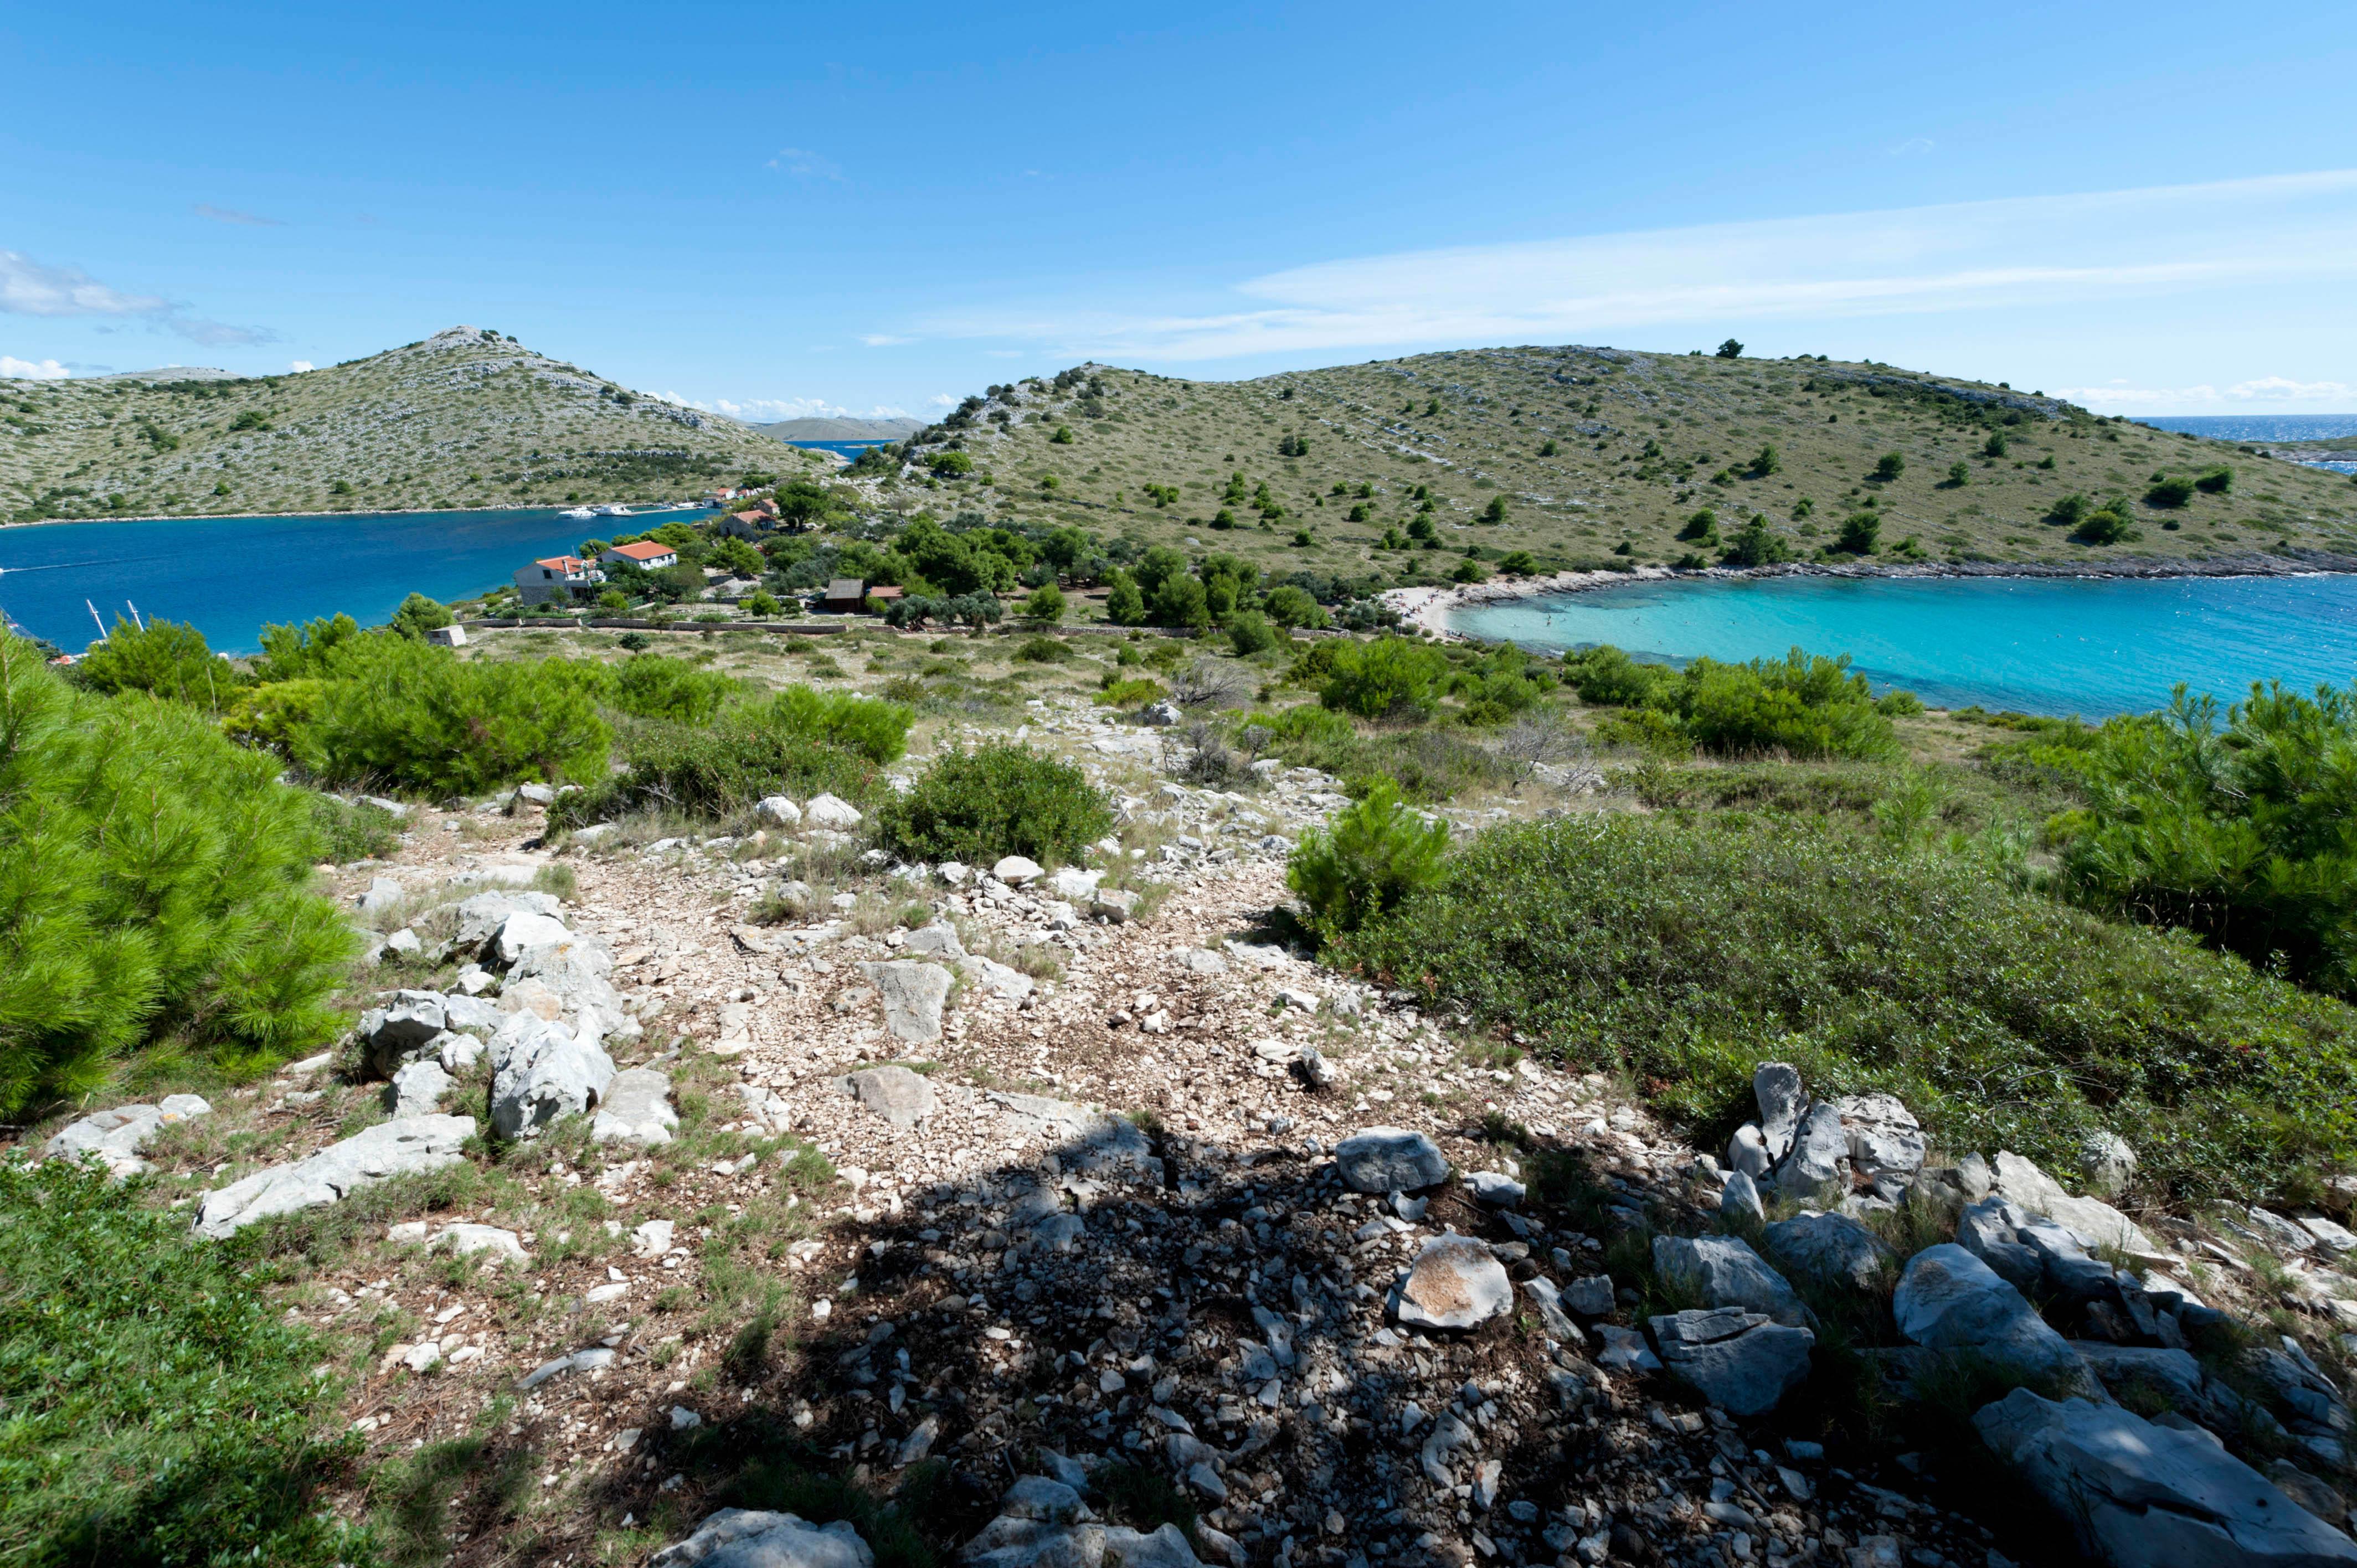 9701-Parc national iles Kornati (Dalmatie du Nord)